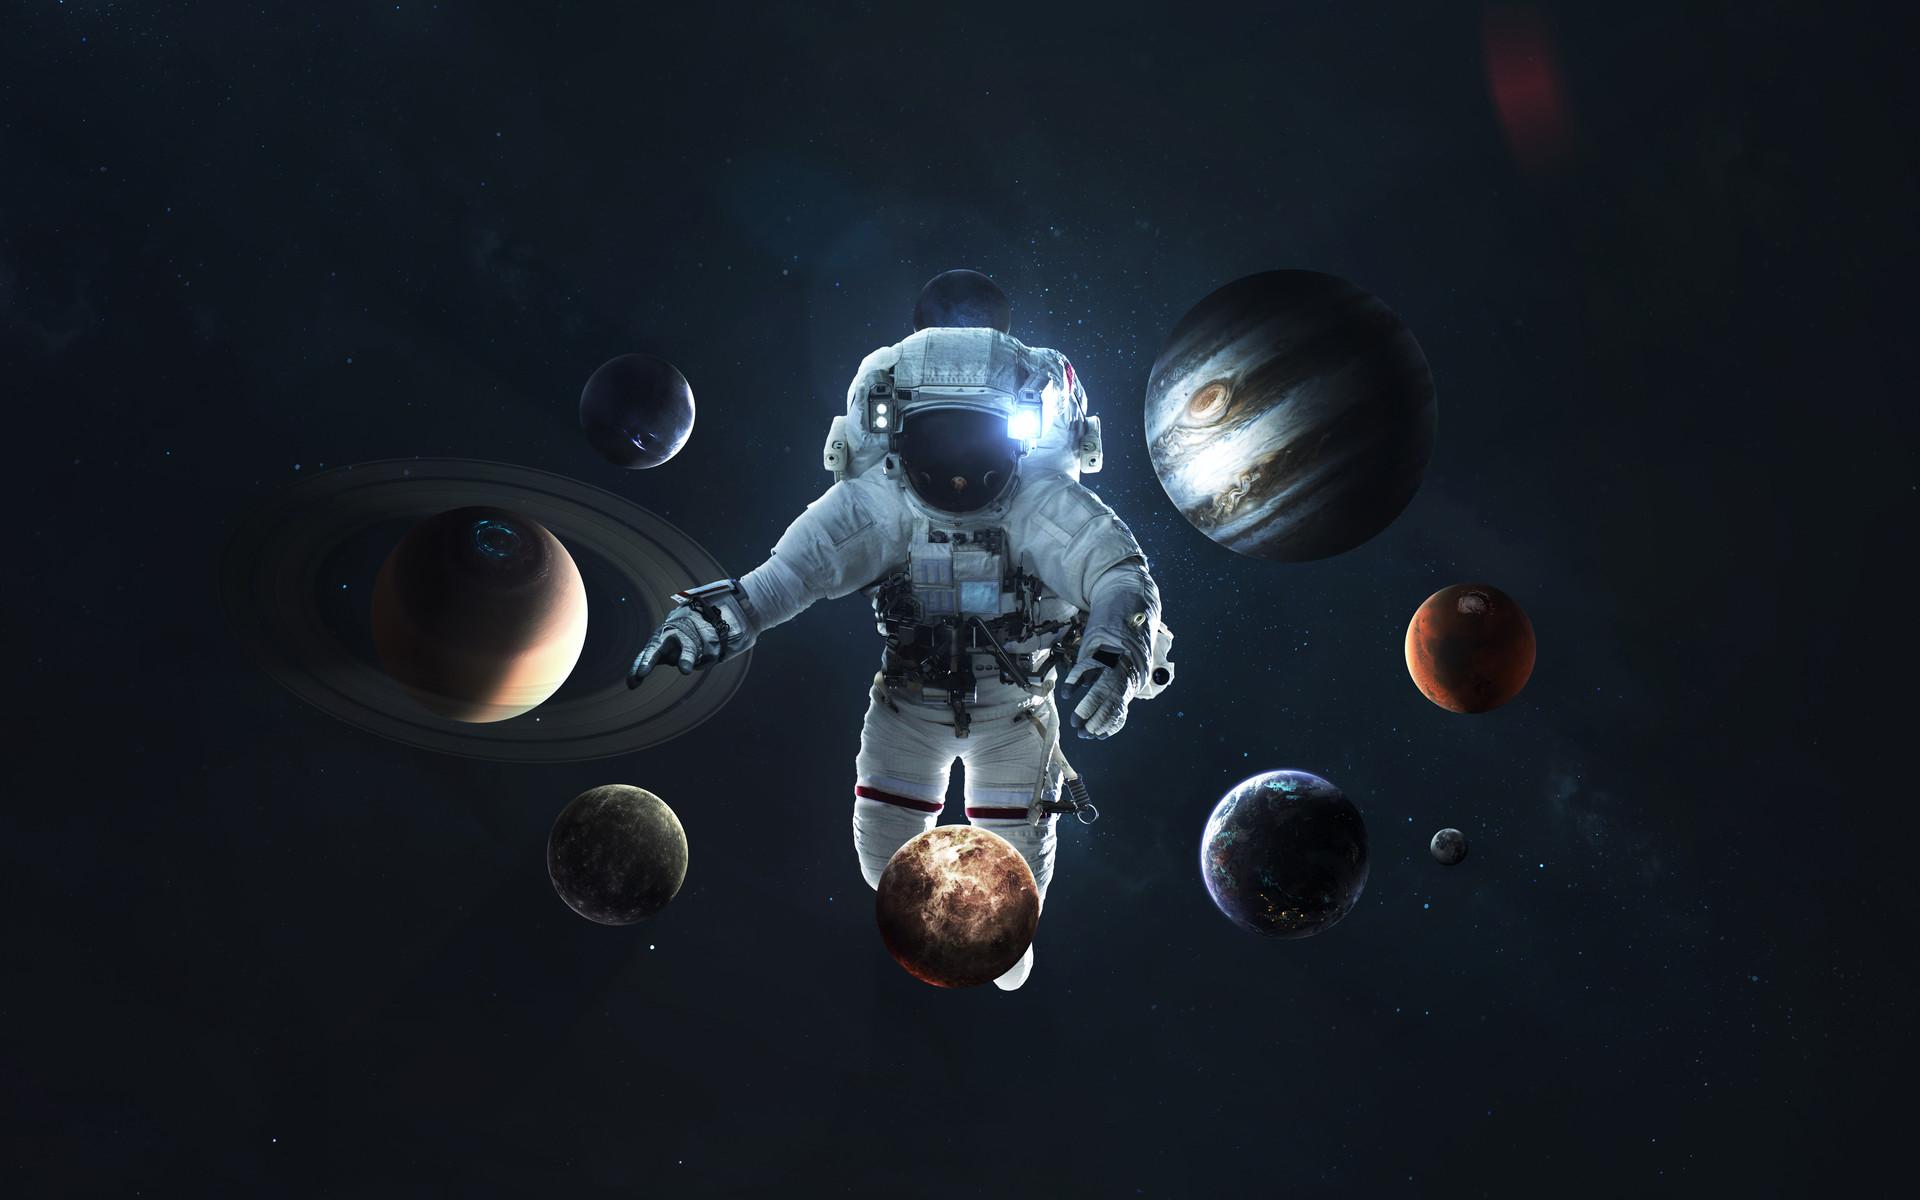 space astronaut galaxy stars Vadimsadovski 1590255